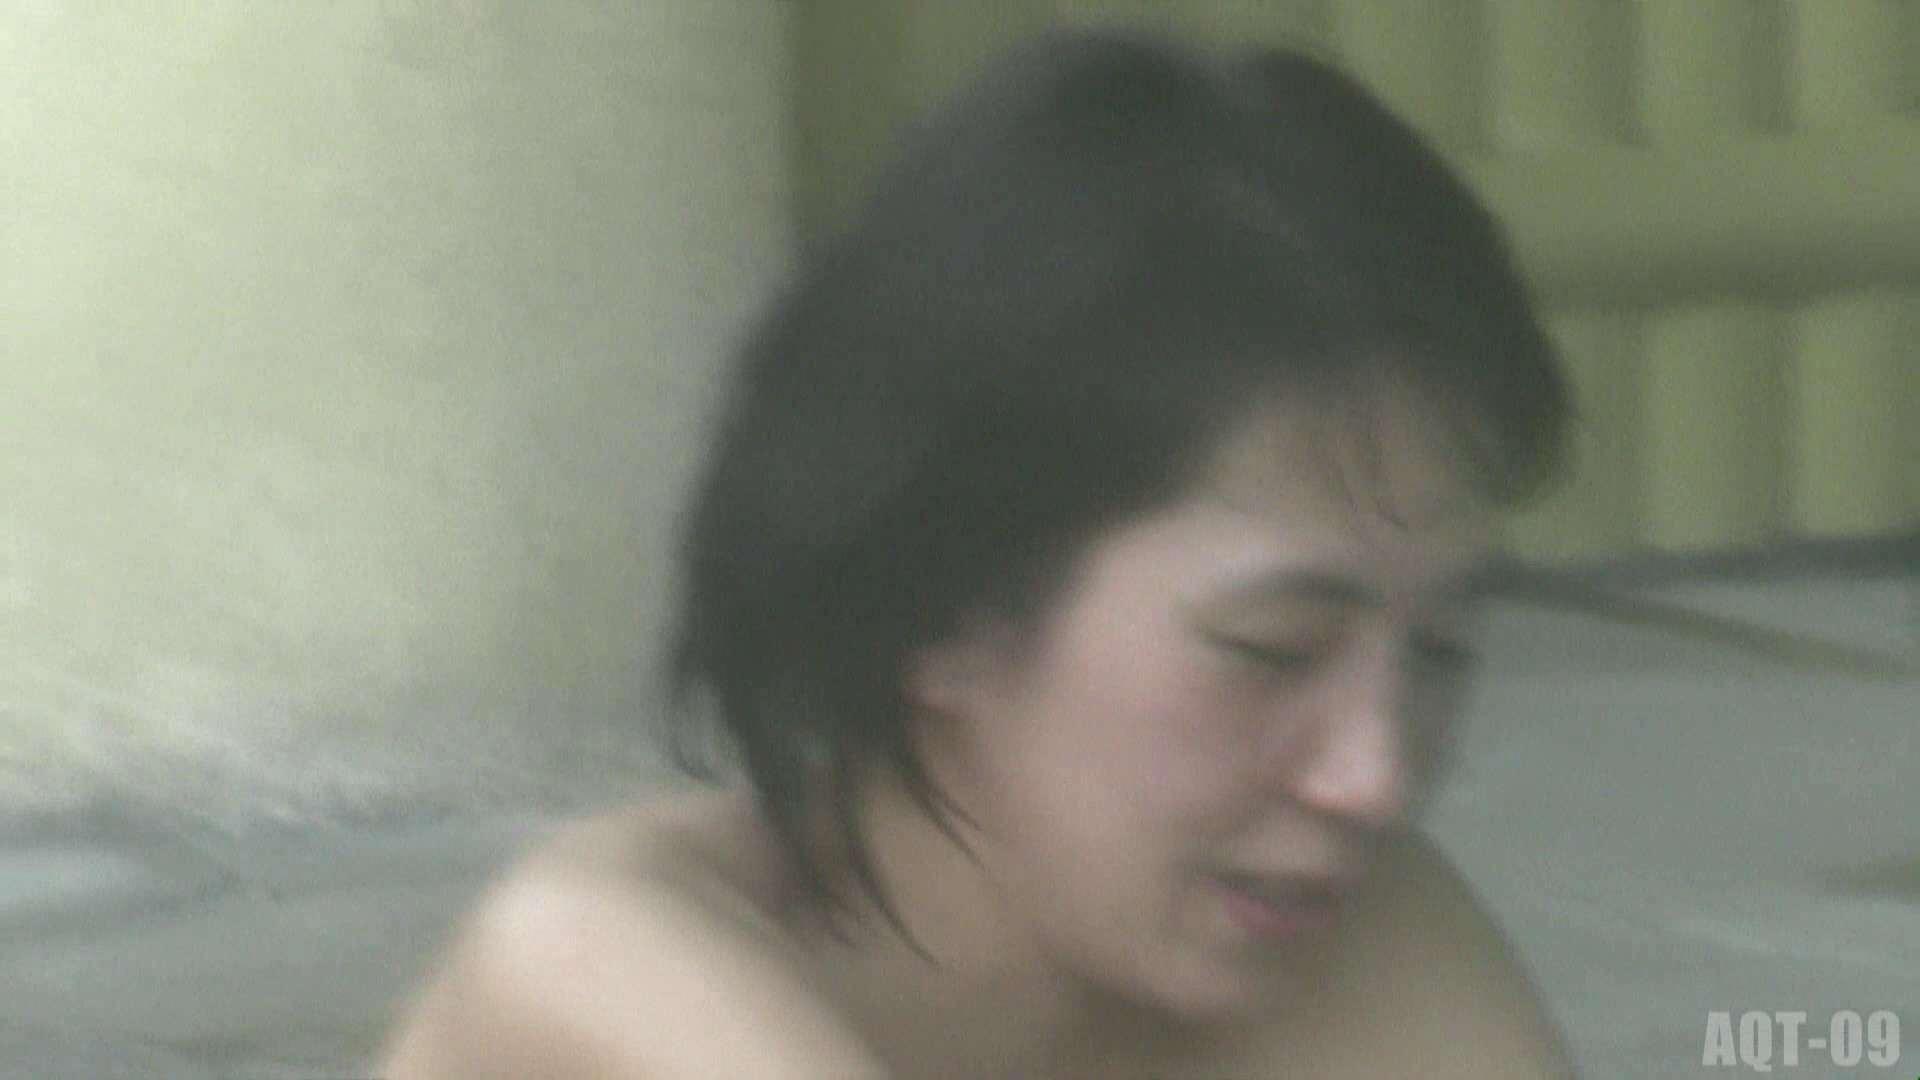 Aquaな露天風呂Vol.788 盗撮師作品  100pic 12